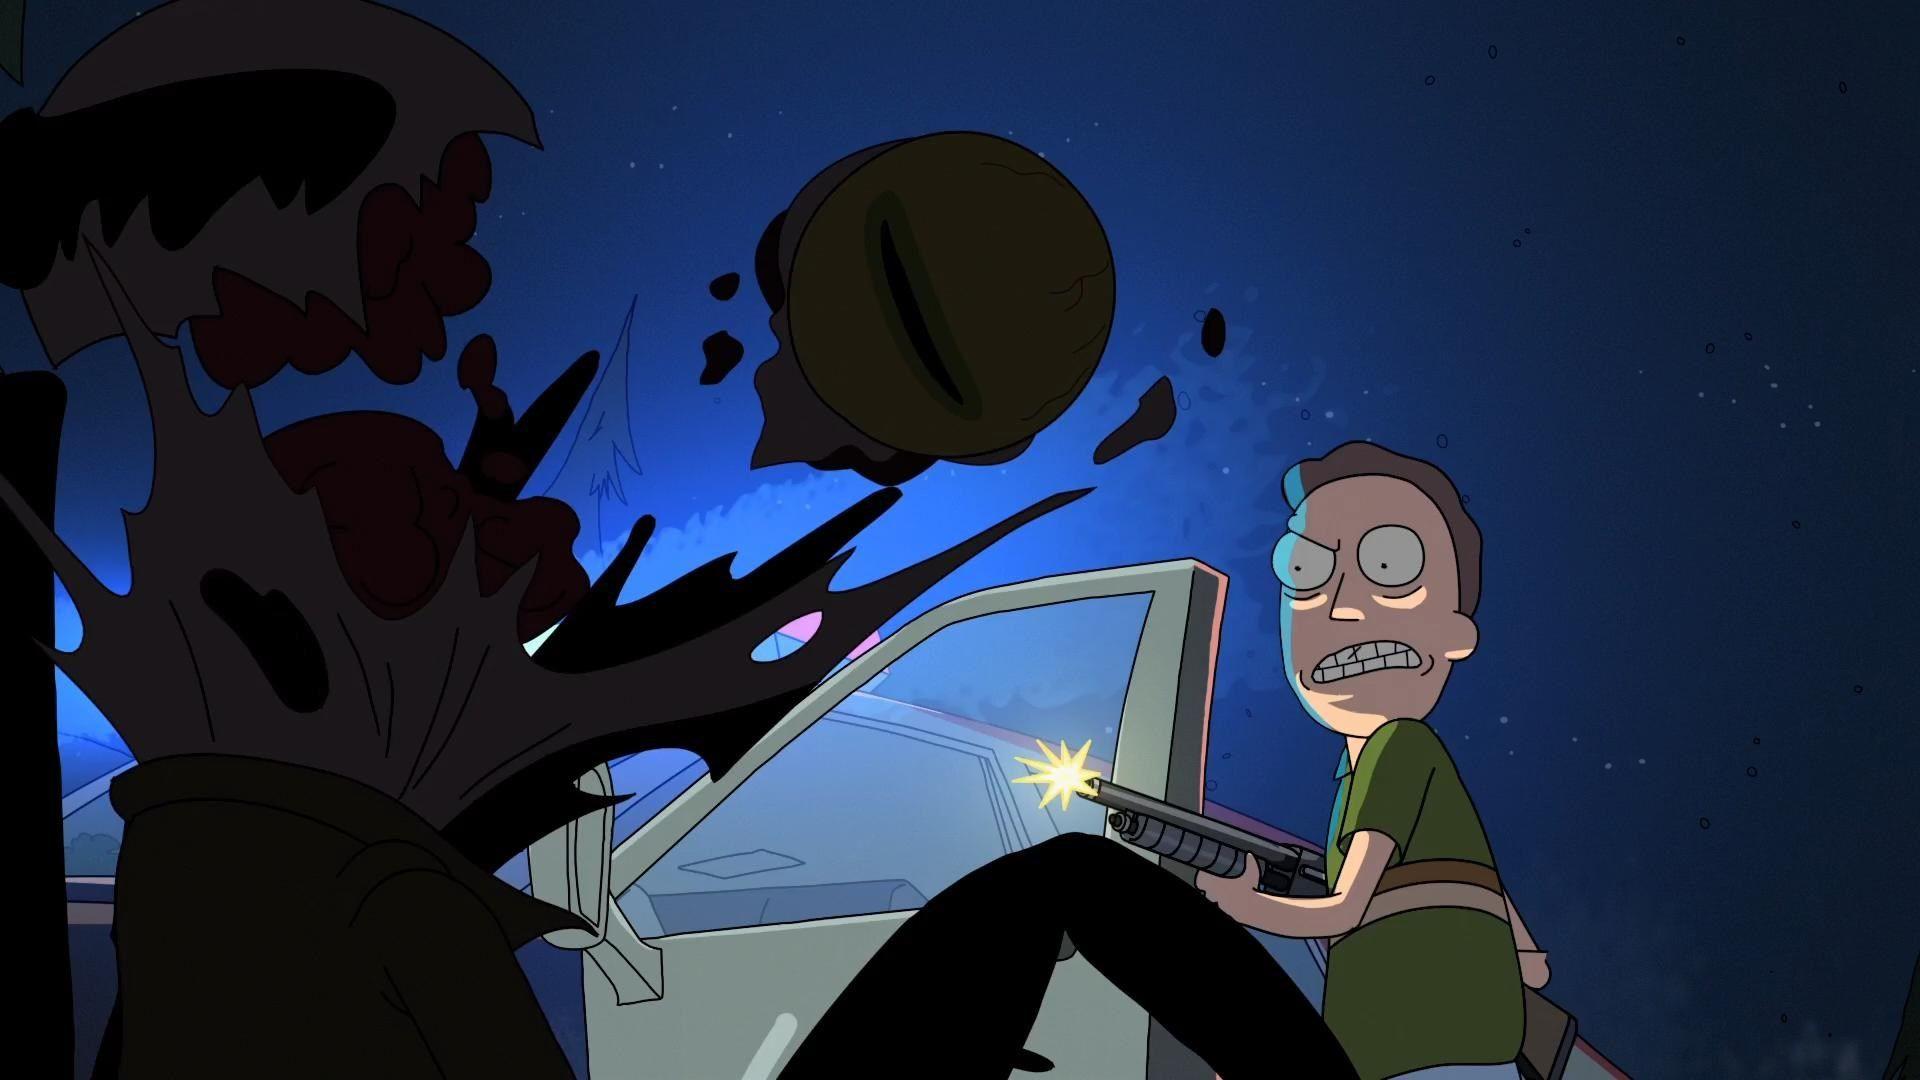 Keshon Thomas Rick And Morty Wallpaper Desktop Nexus